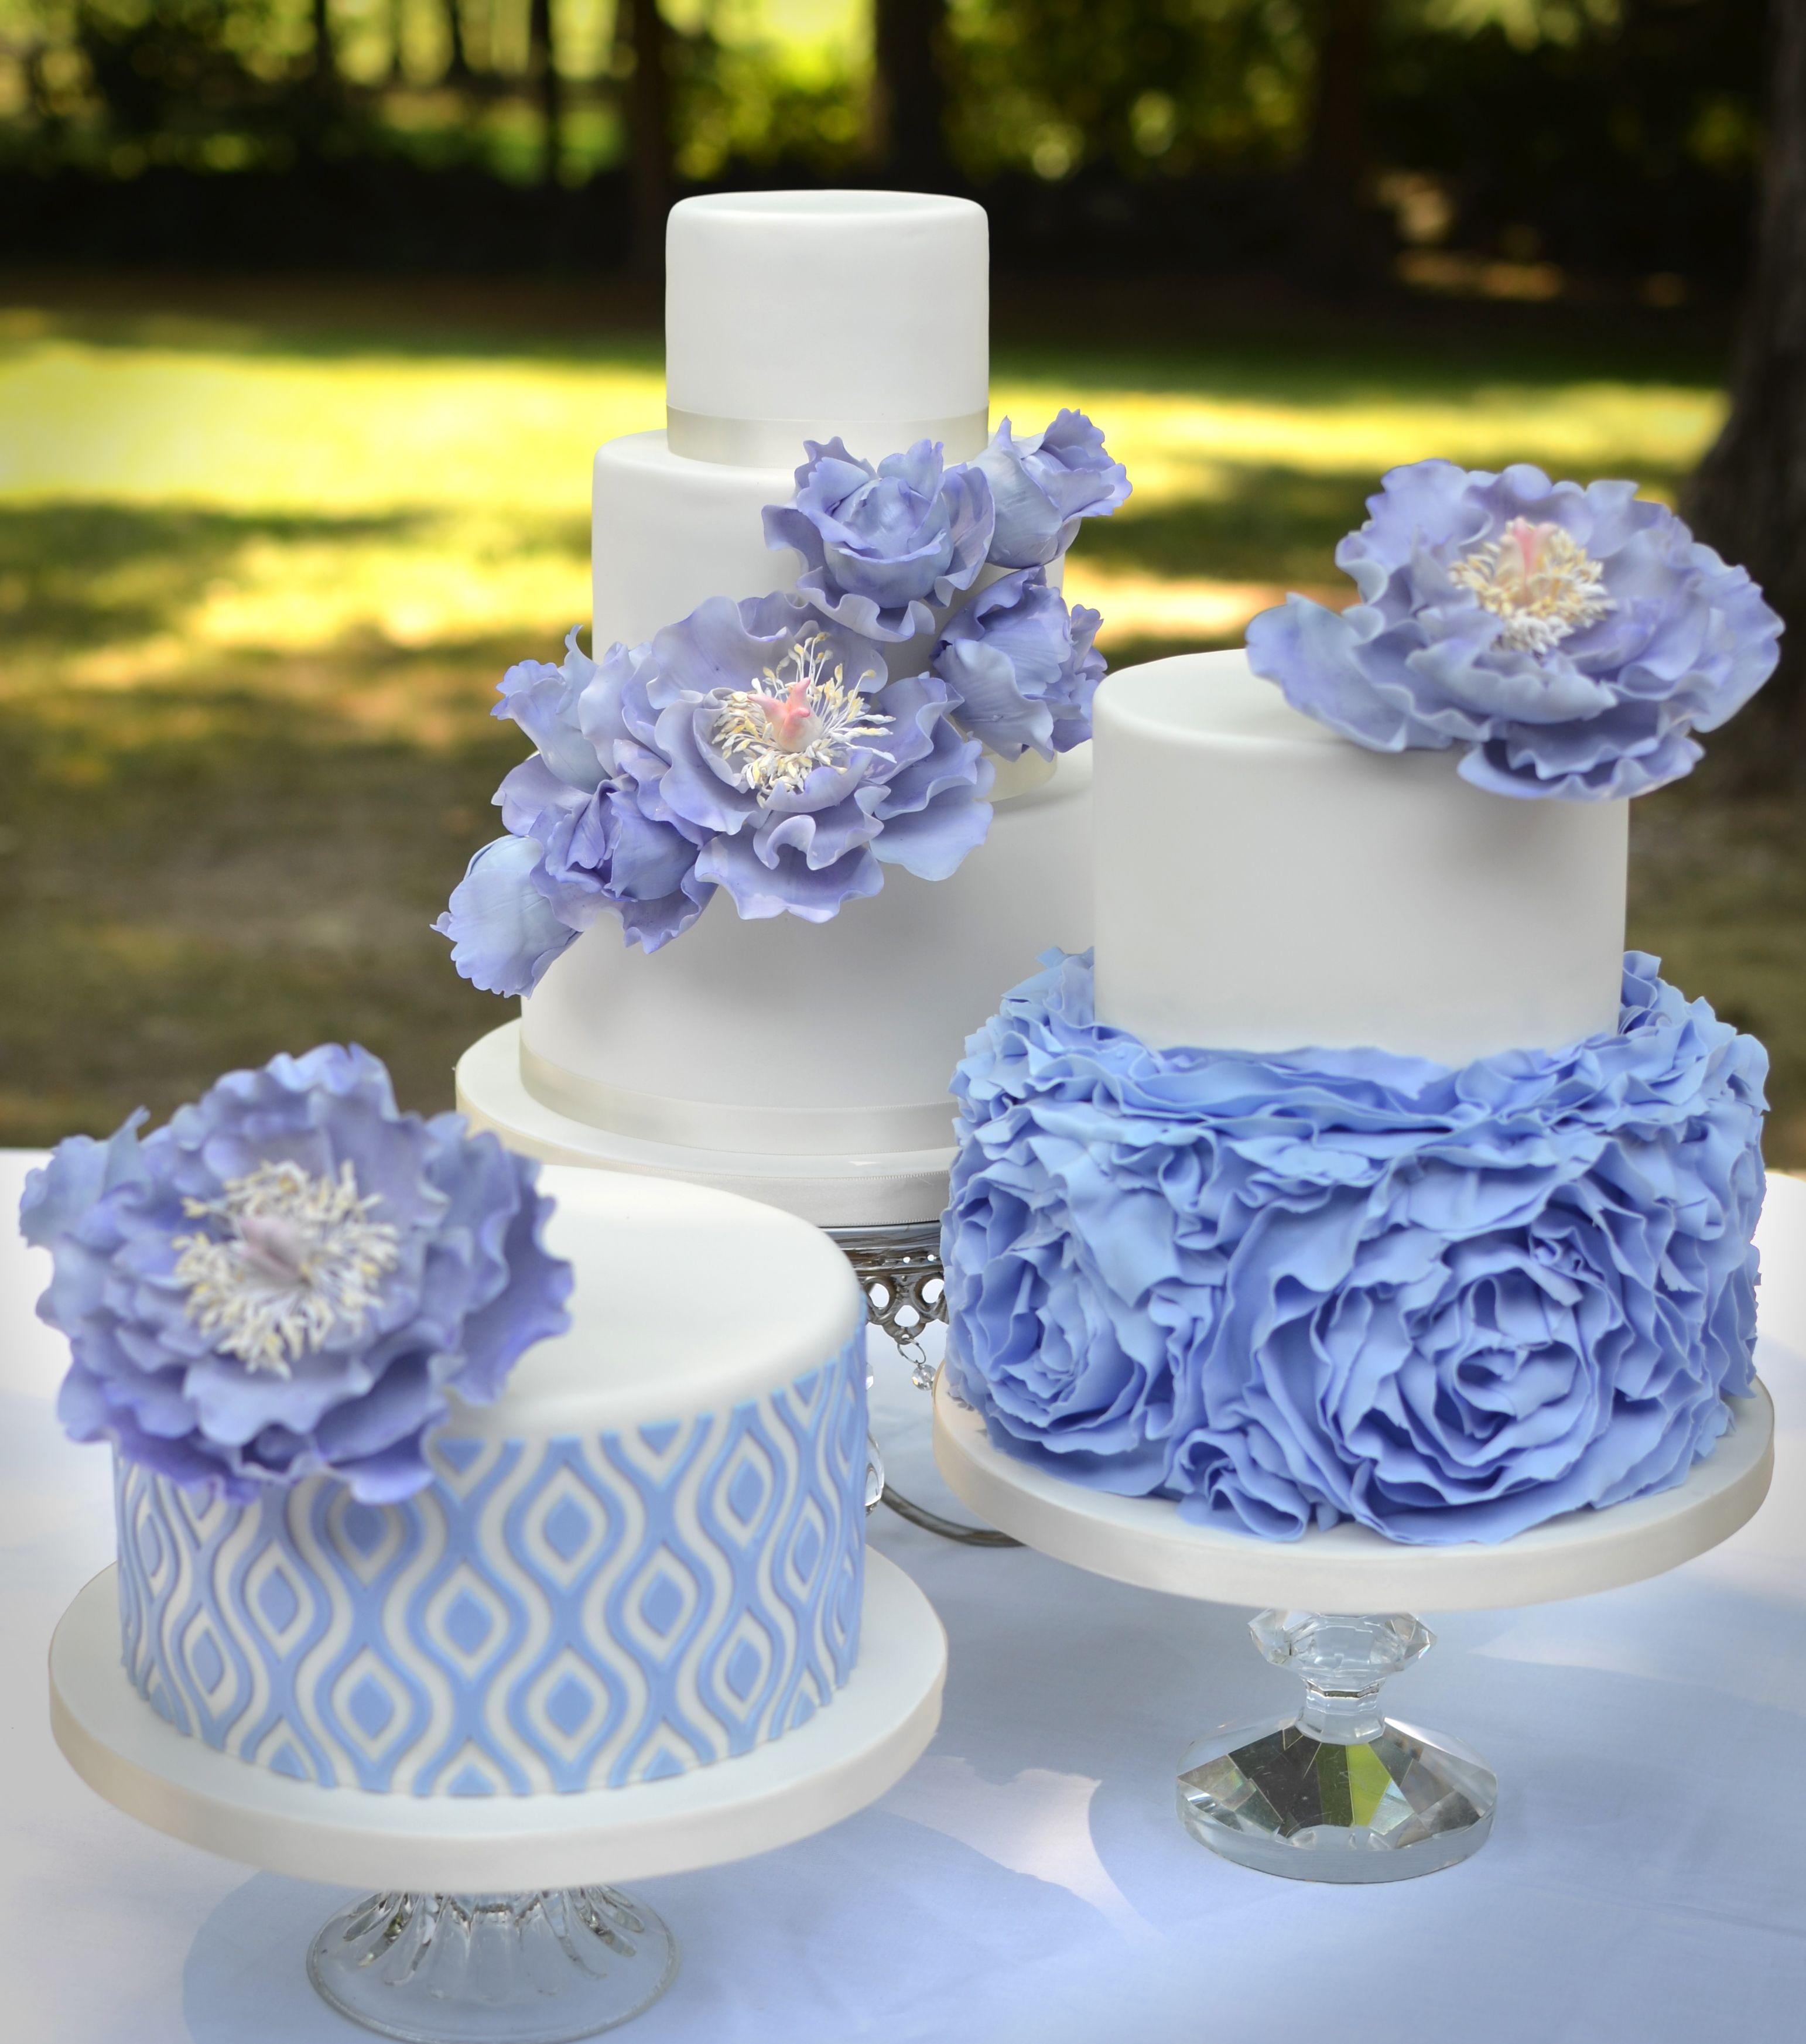 Bridal Shower Cakes - Rosies Creative Cakes